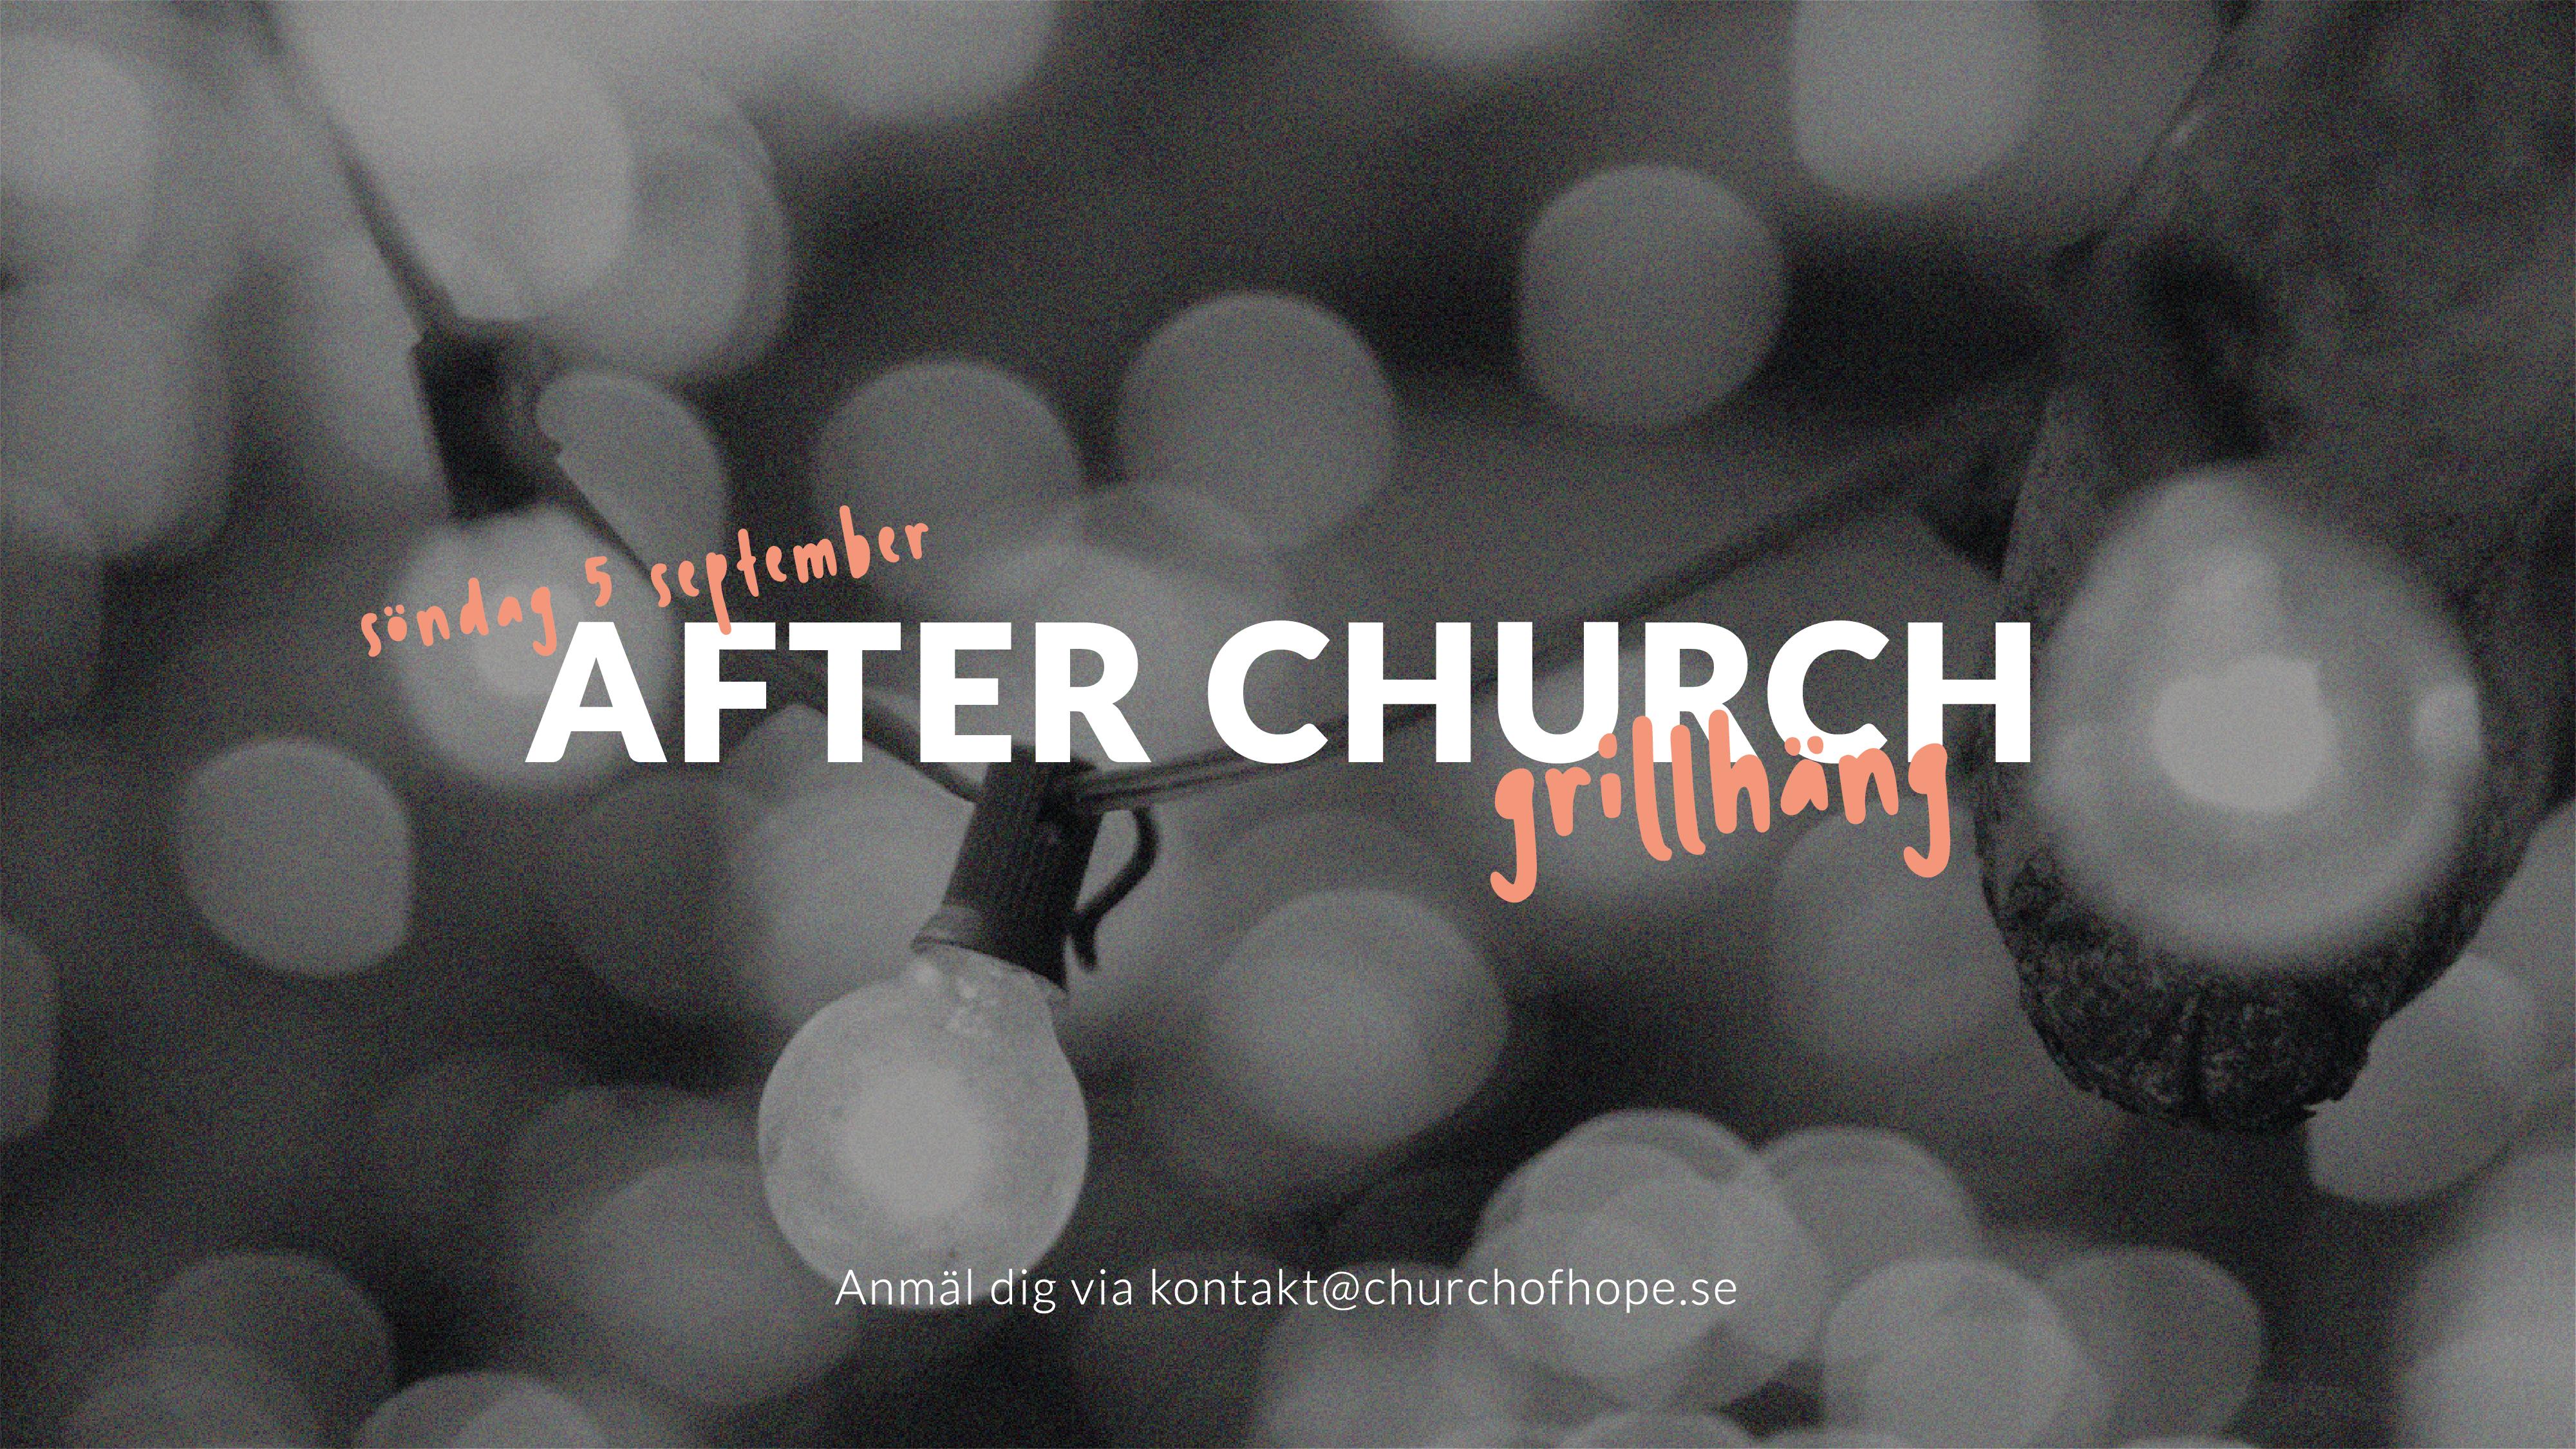 After church